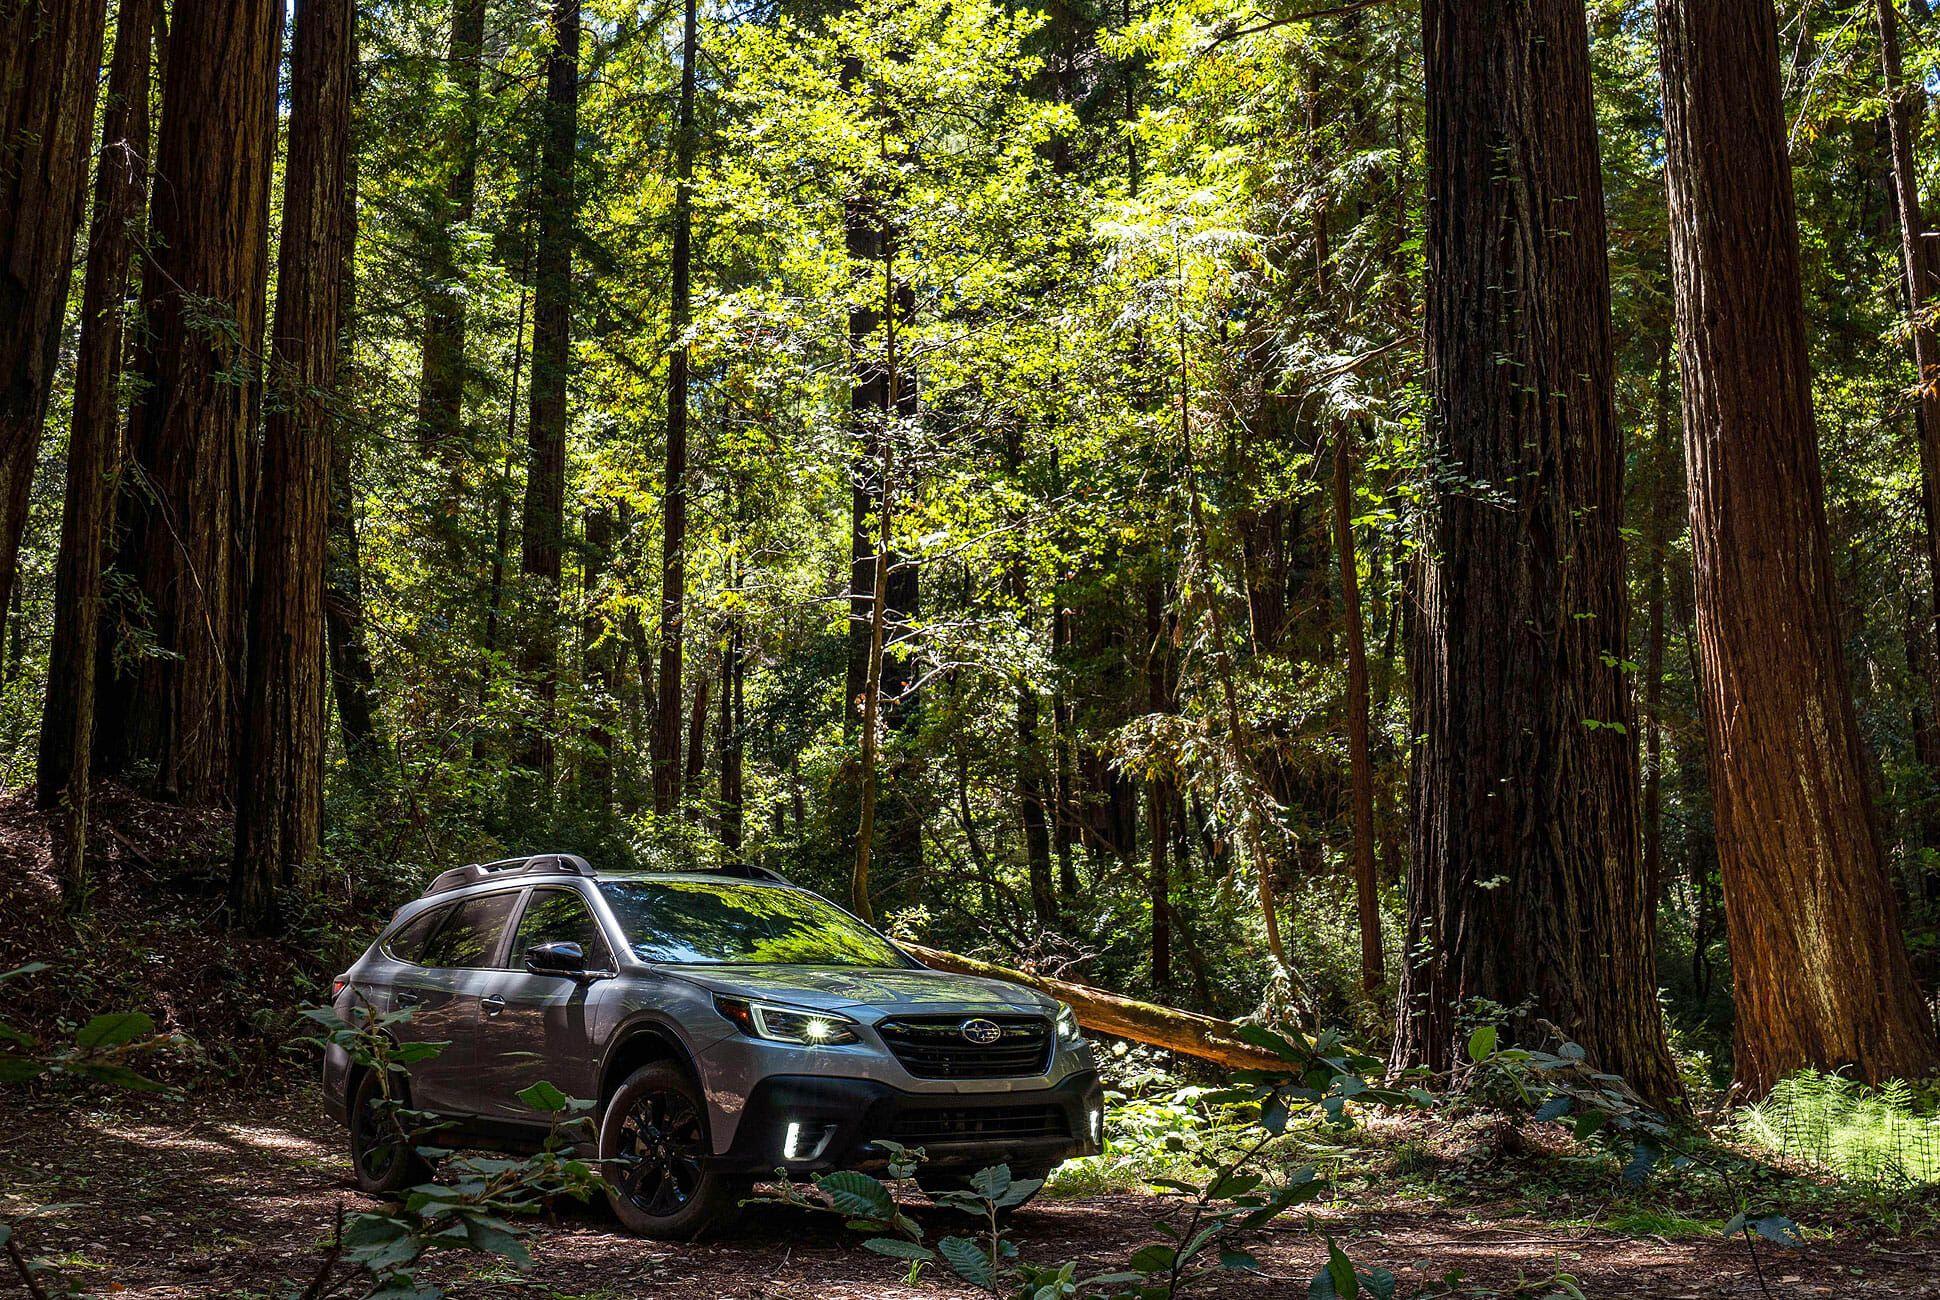 2020-Subaru-Outback-Review-gear-patrol-slide-1